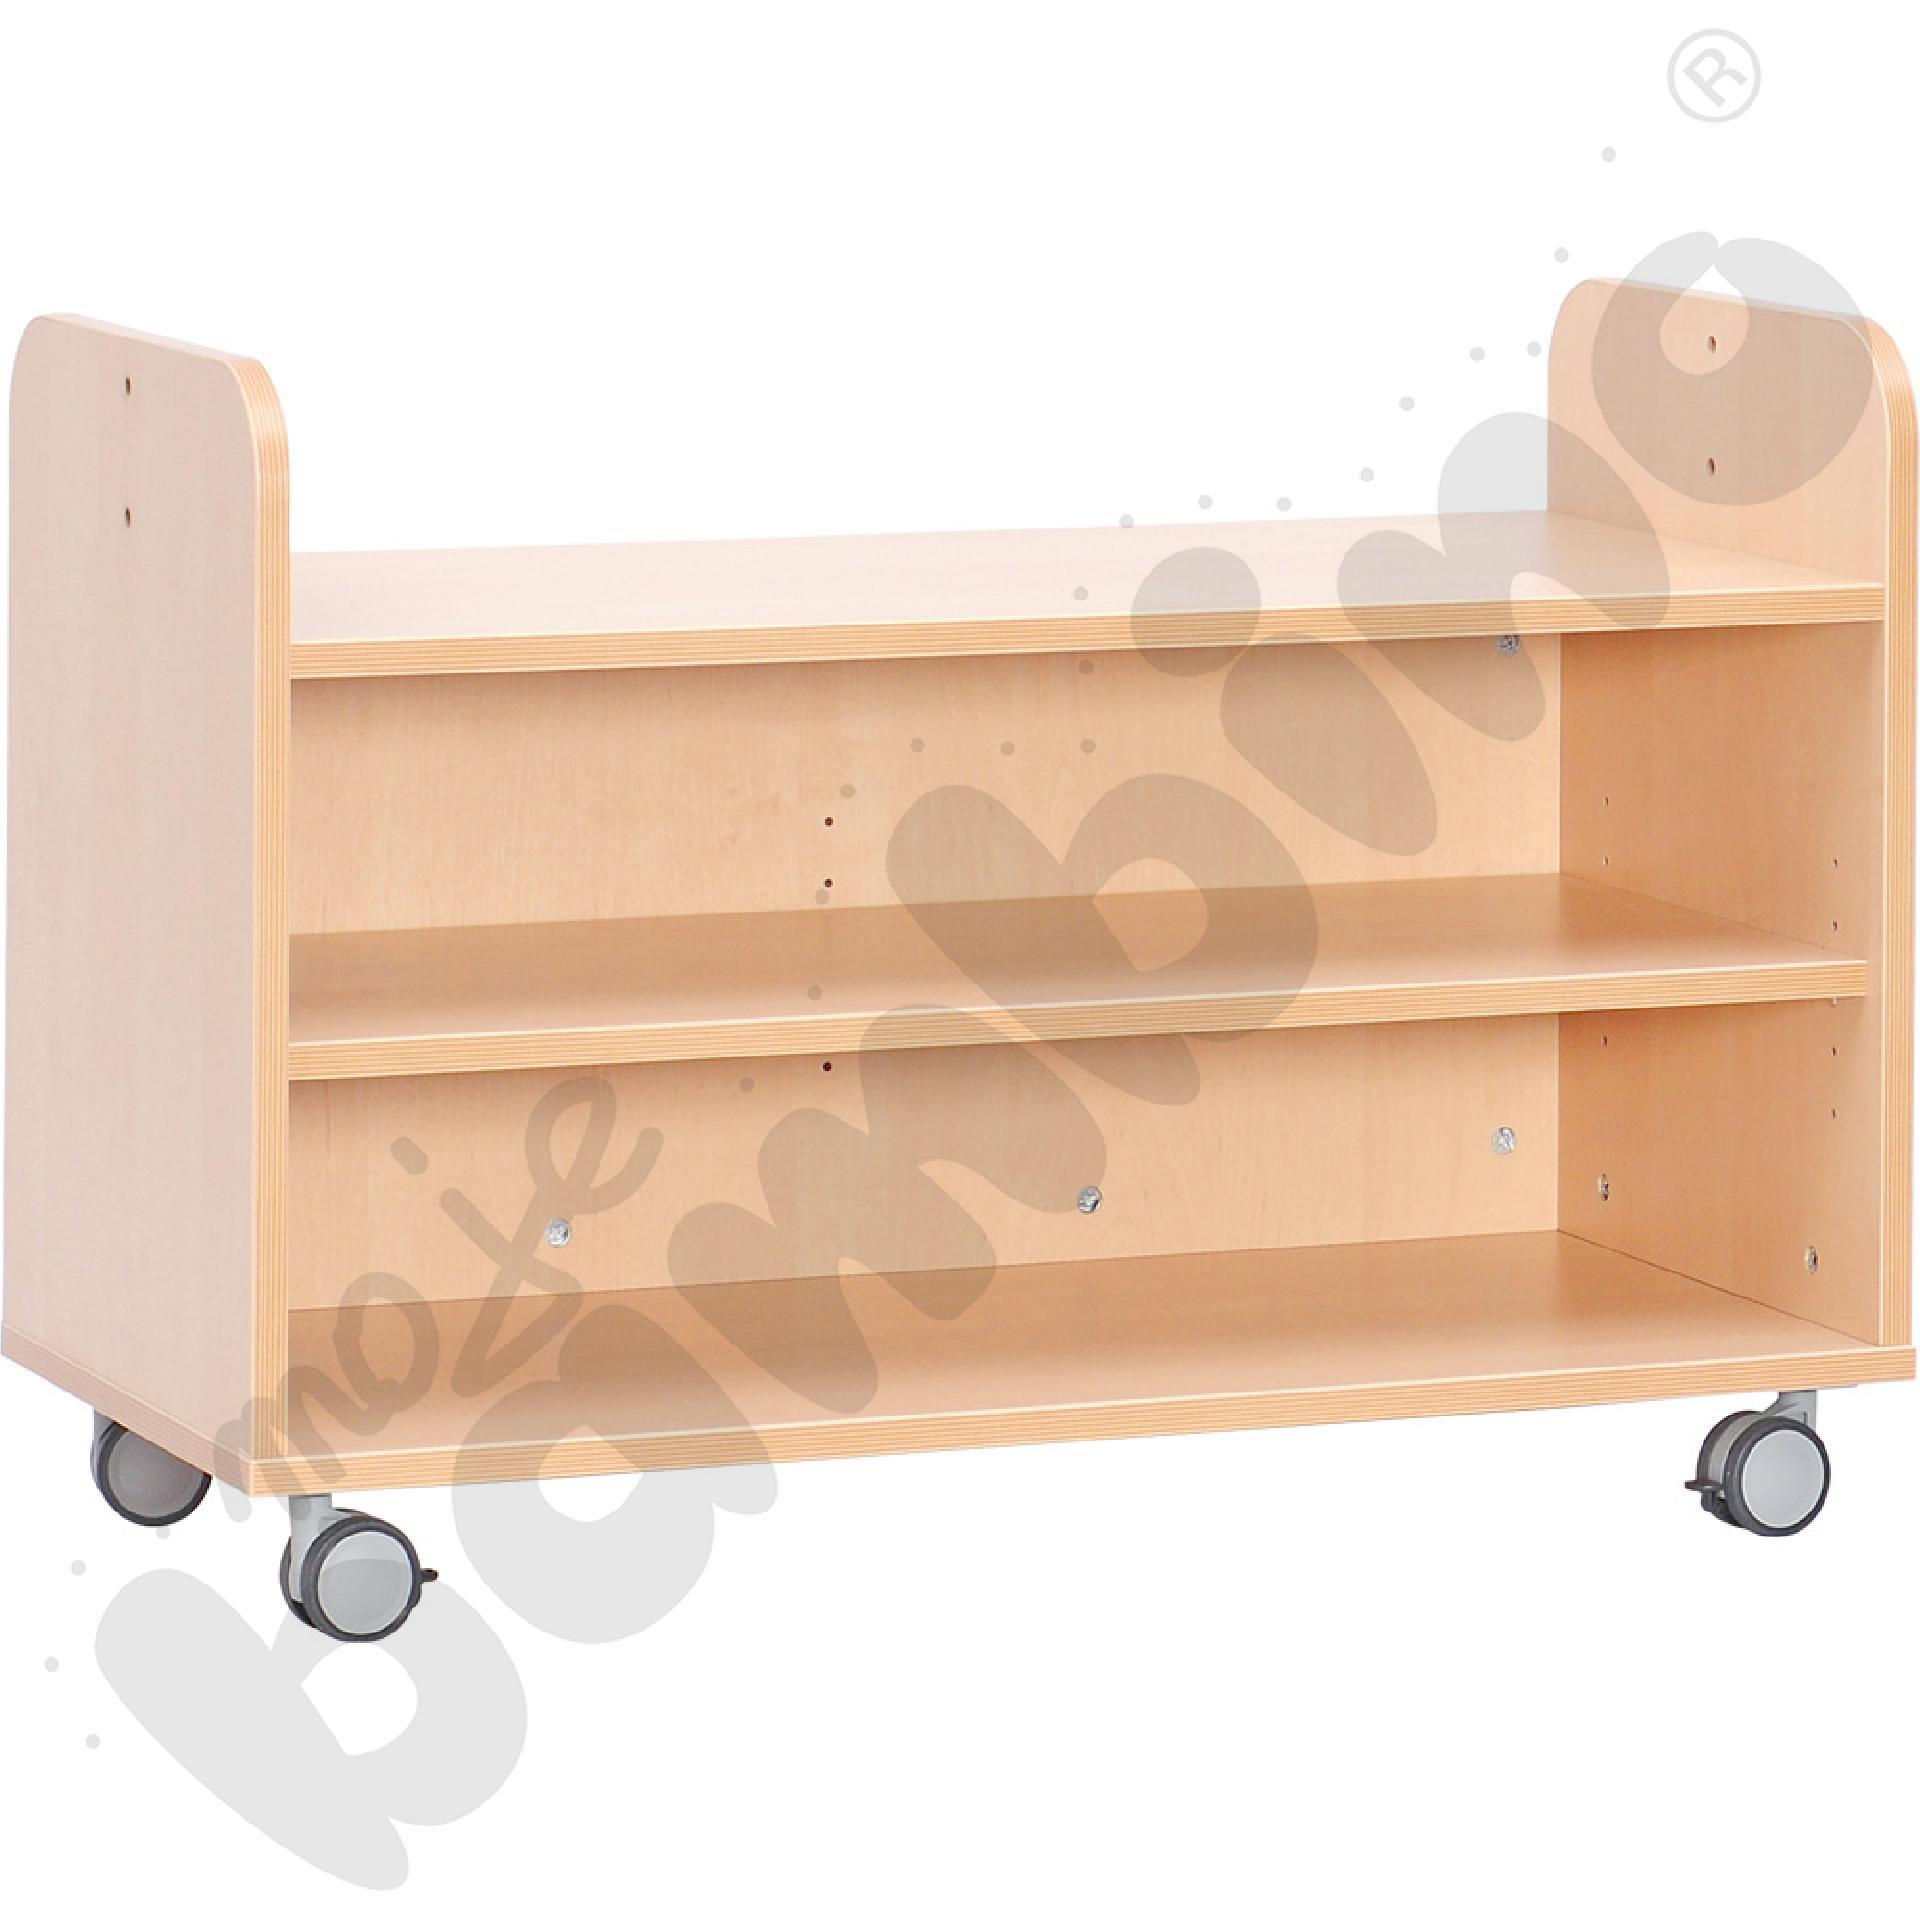 Mobilna szafka z półką do...